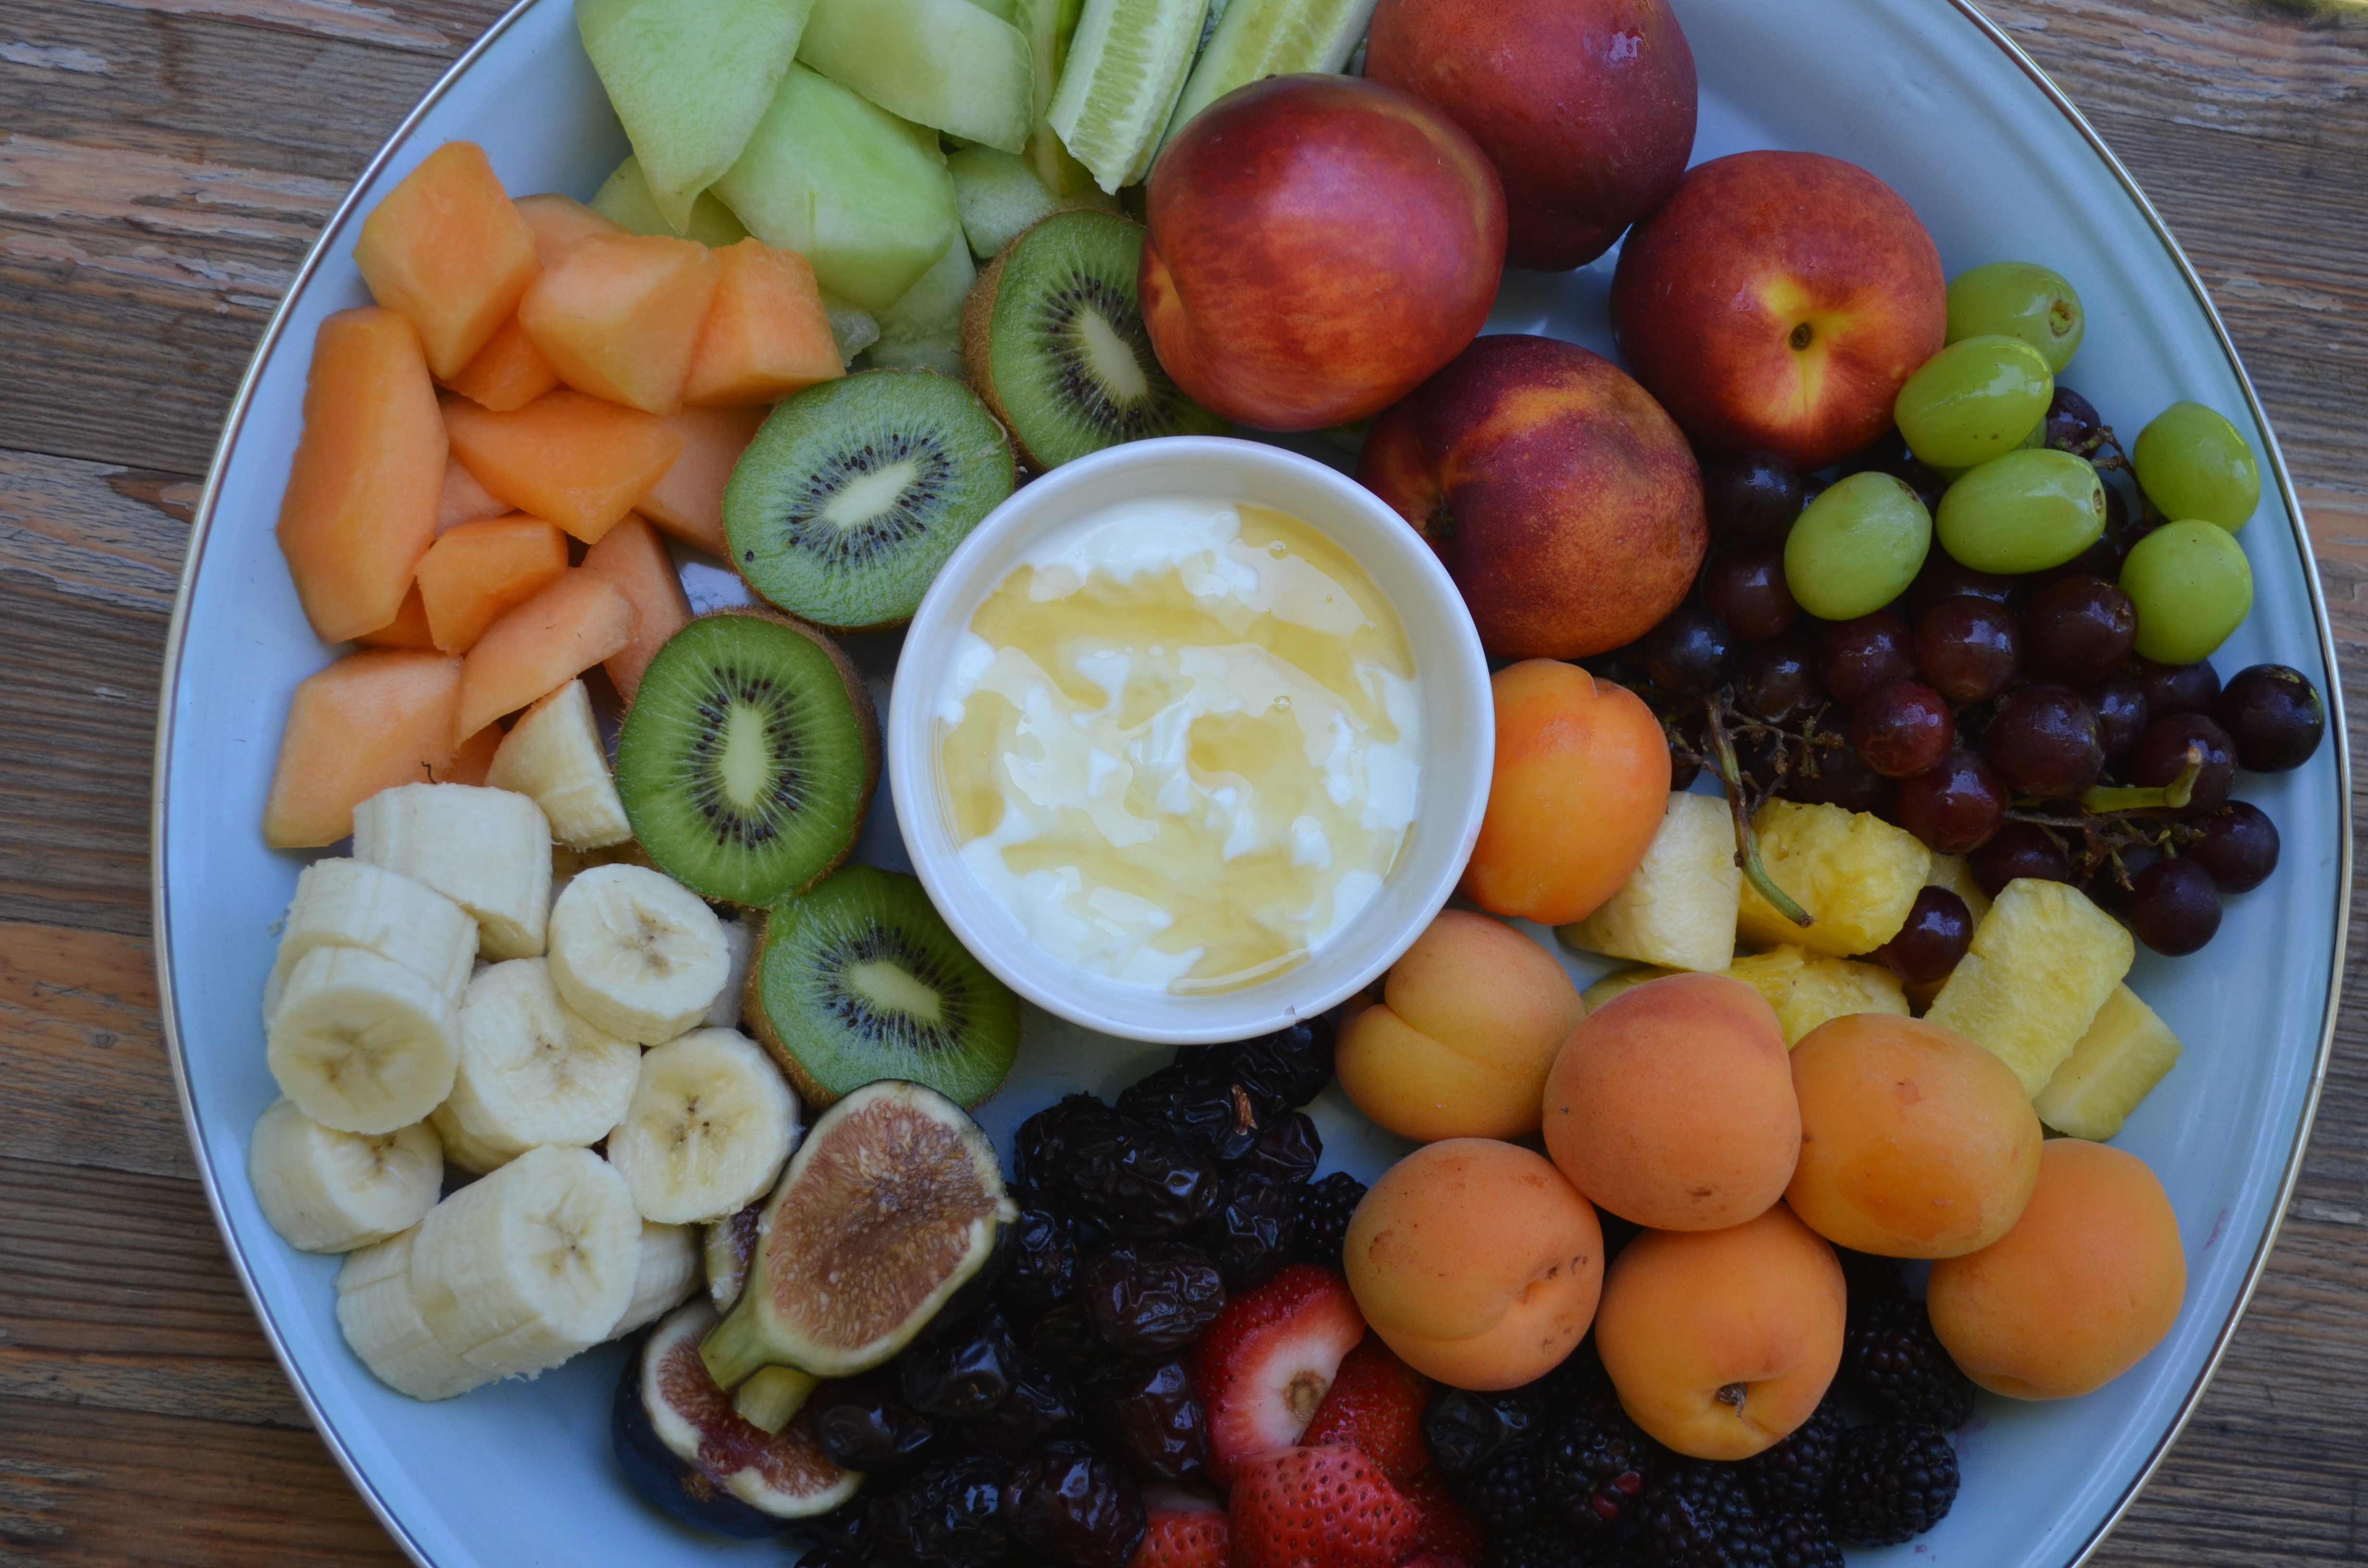 Party Platter Fruit Salad With Yogurt Honey Yvonne Maffei Home Lifestyle